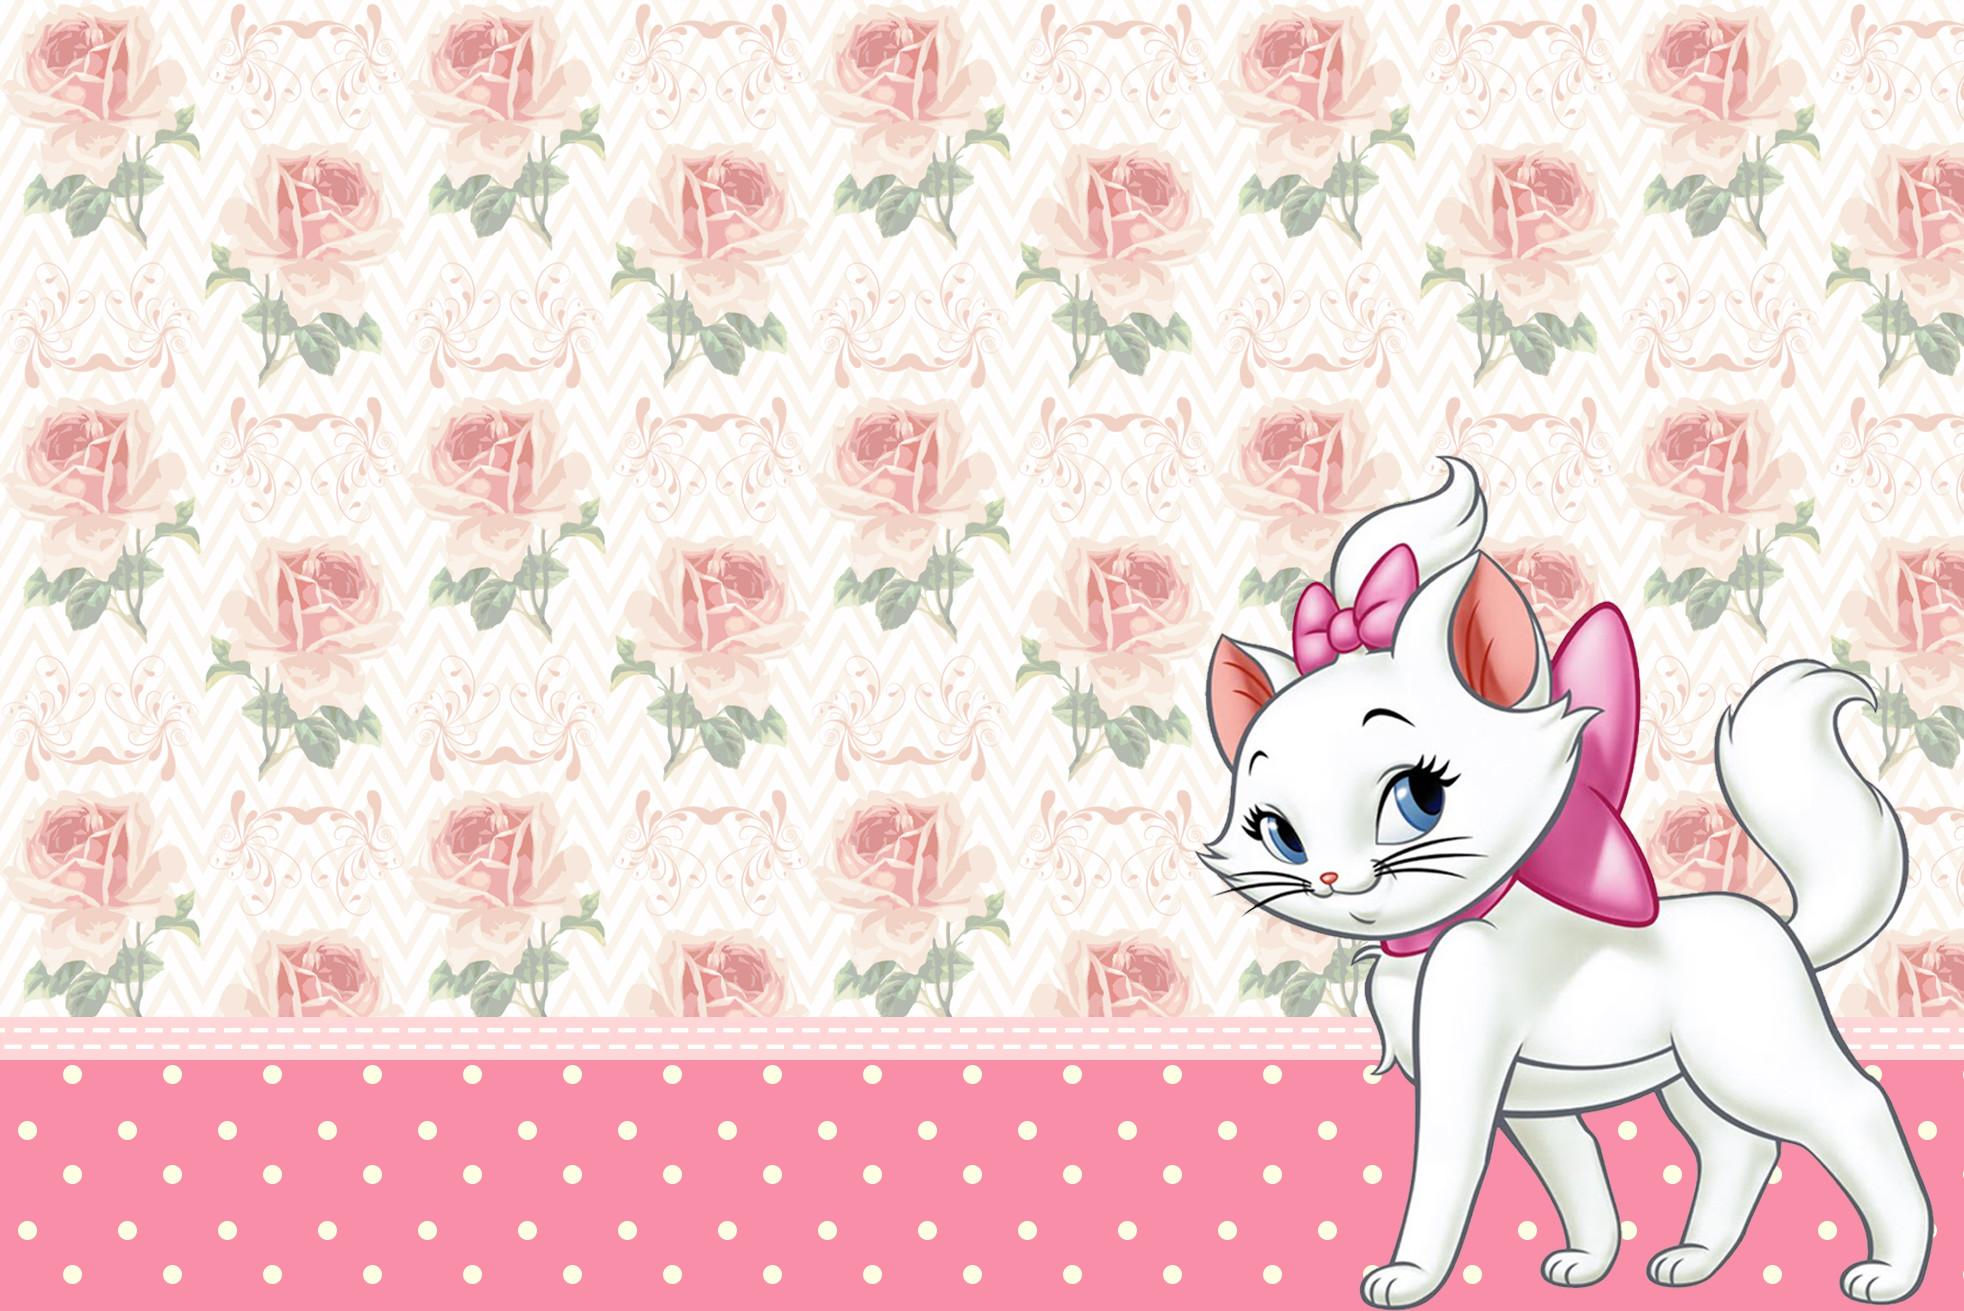 Wallpaper Cute Emojis Marie Aristocats Wallpaper 183 ① Wallpapertag